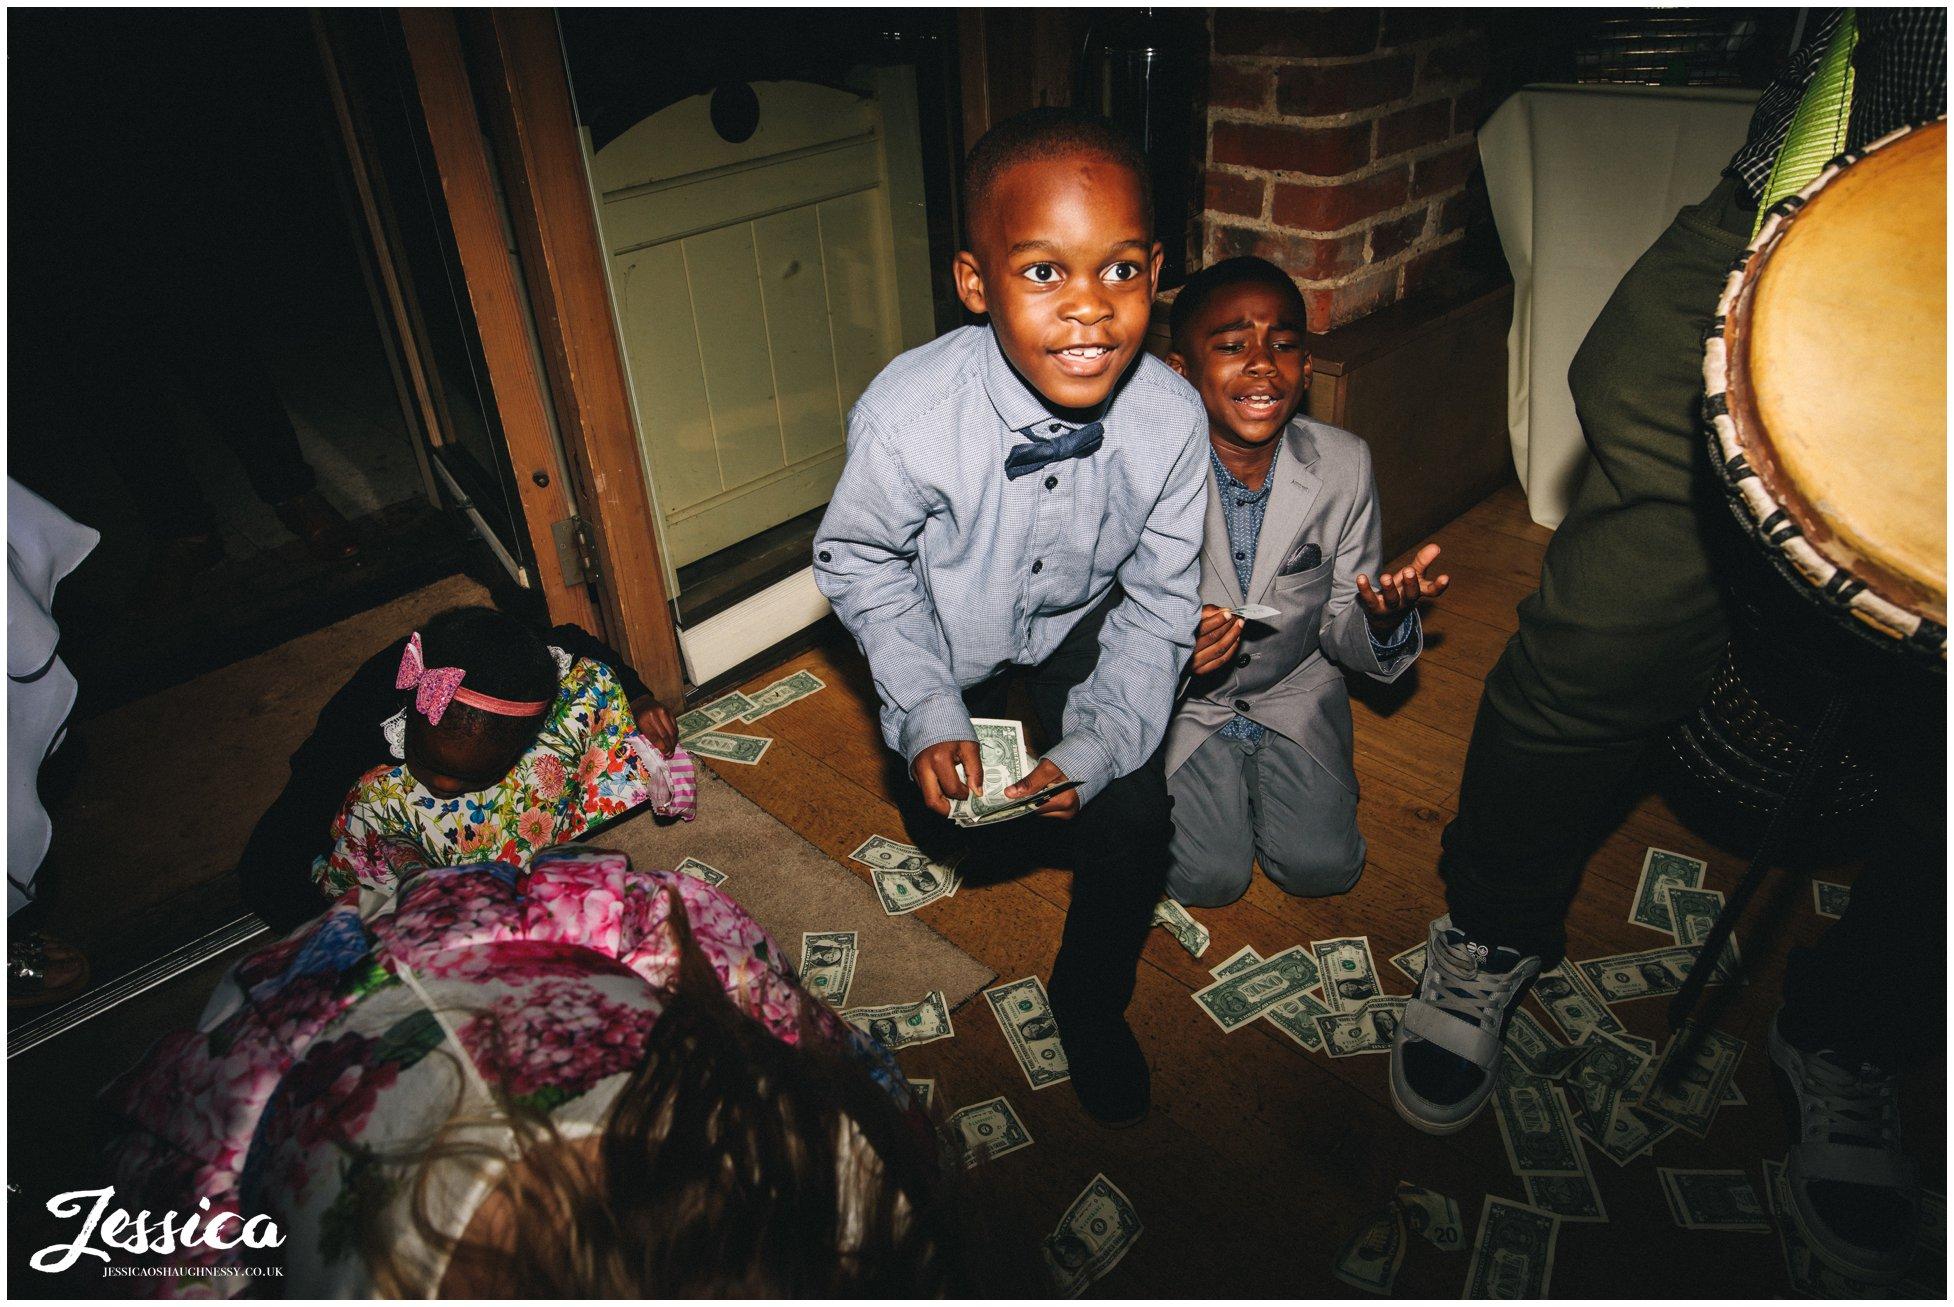 children pick up the fallen money